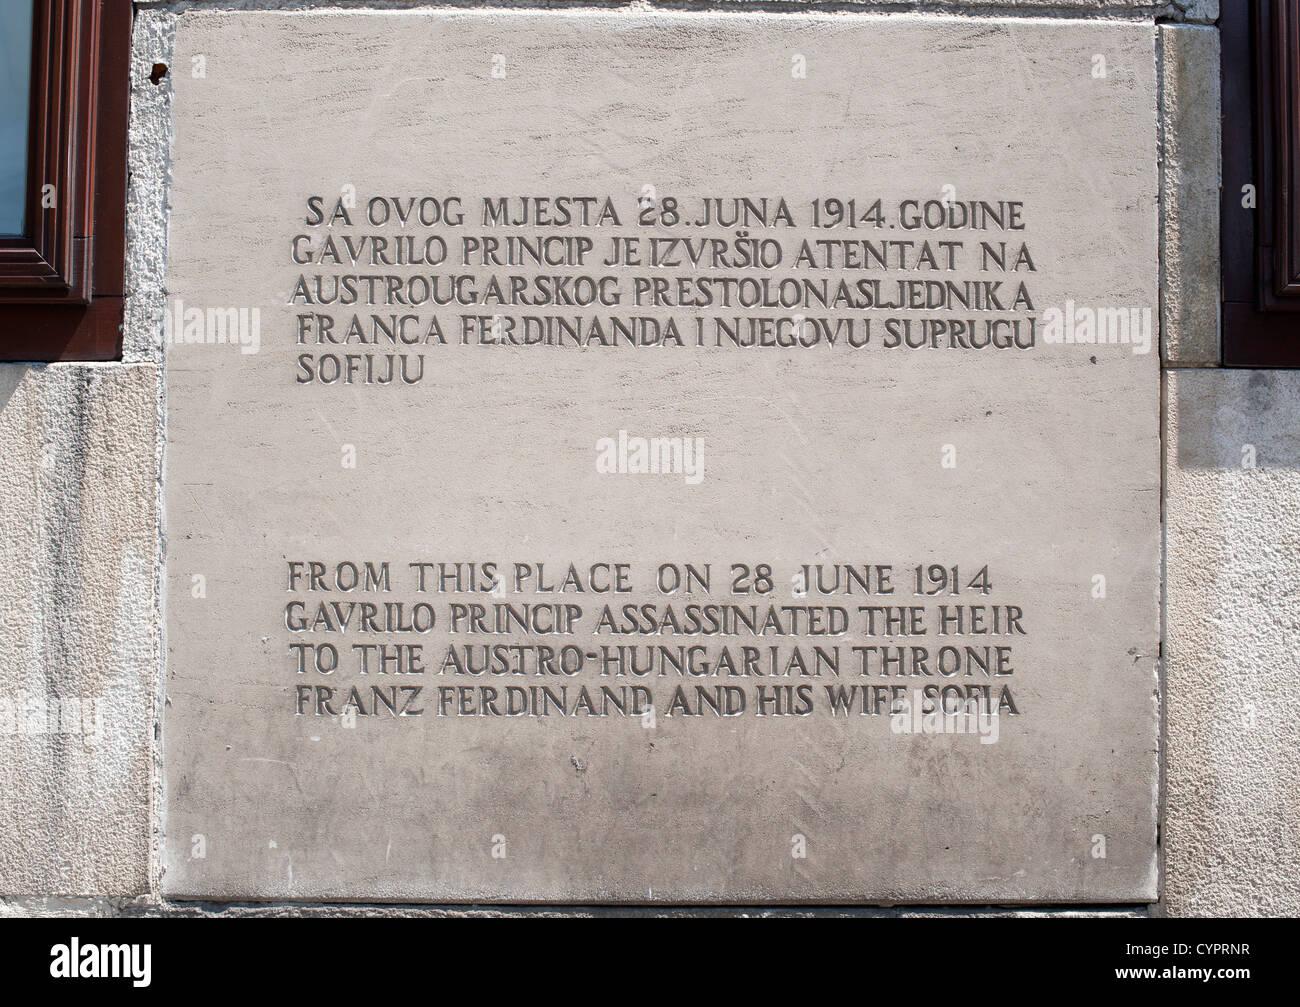 Plaque marking where Gavrilo Princip assassinated Archduke Franz Ferdinand and his wife Sofia in Sarajevo on 28 - Stock Image